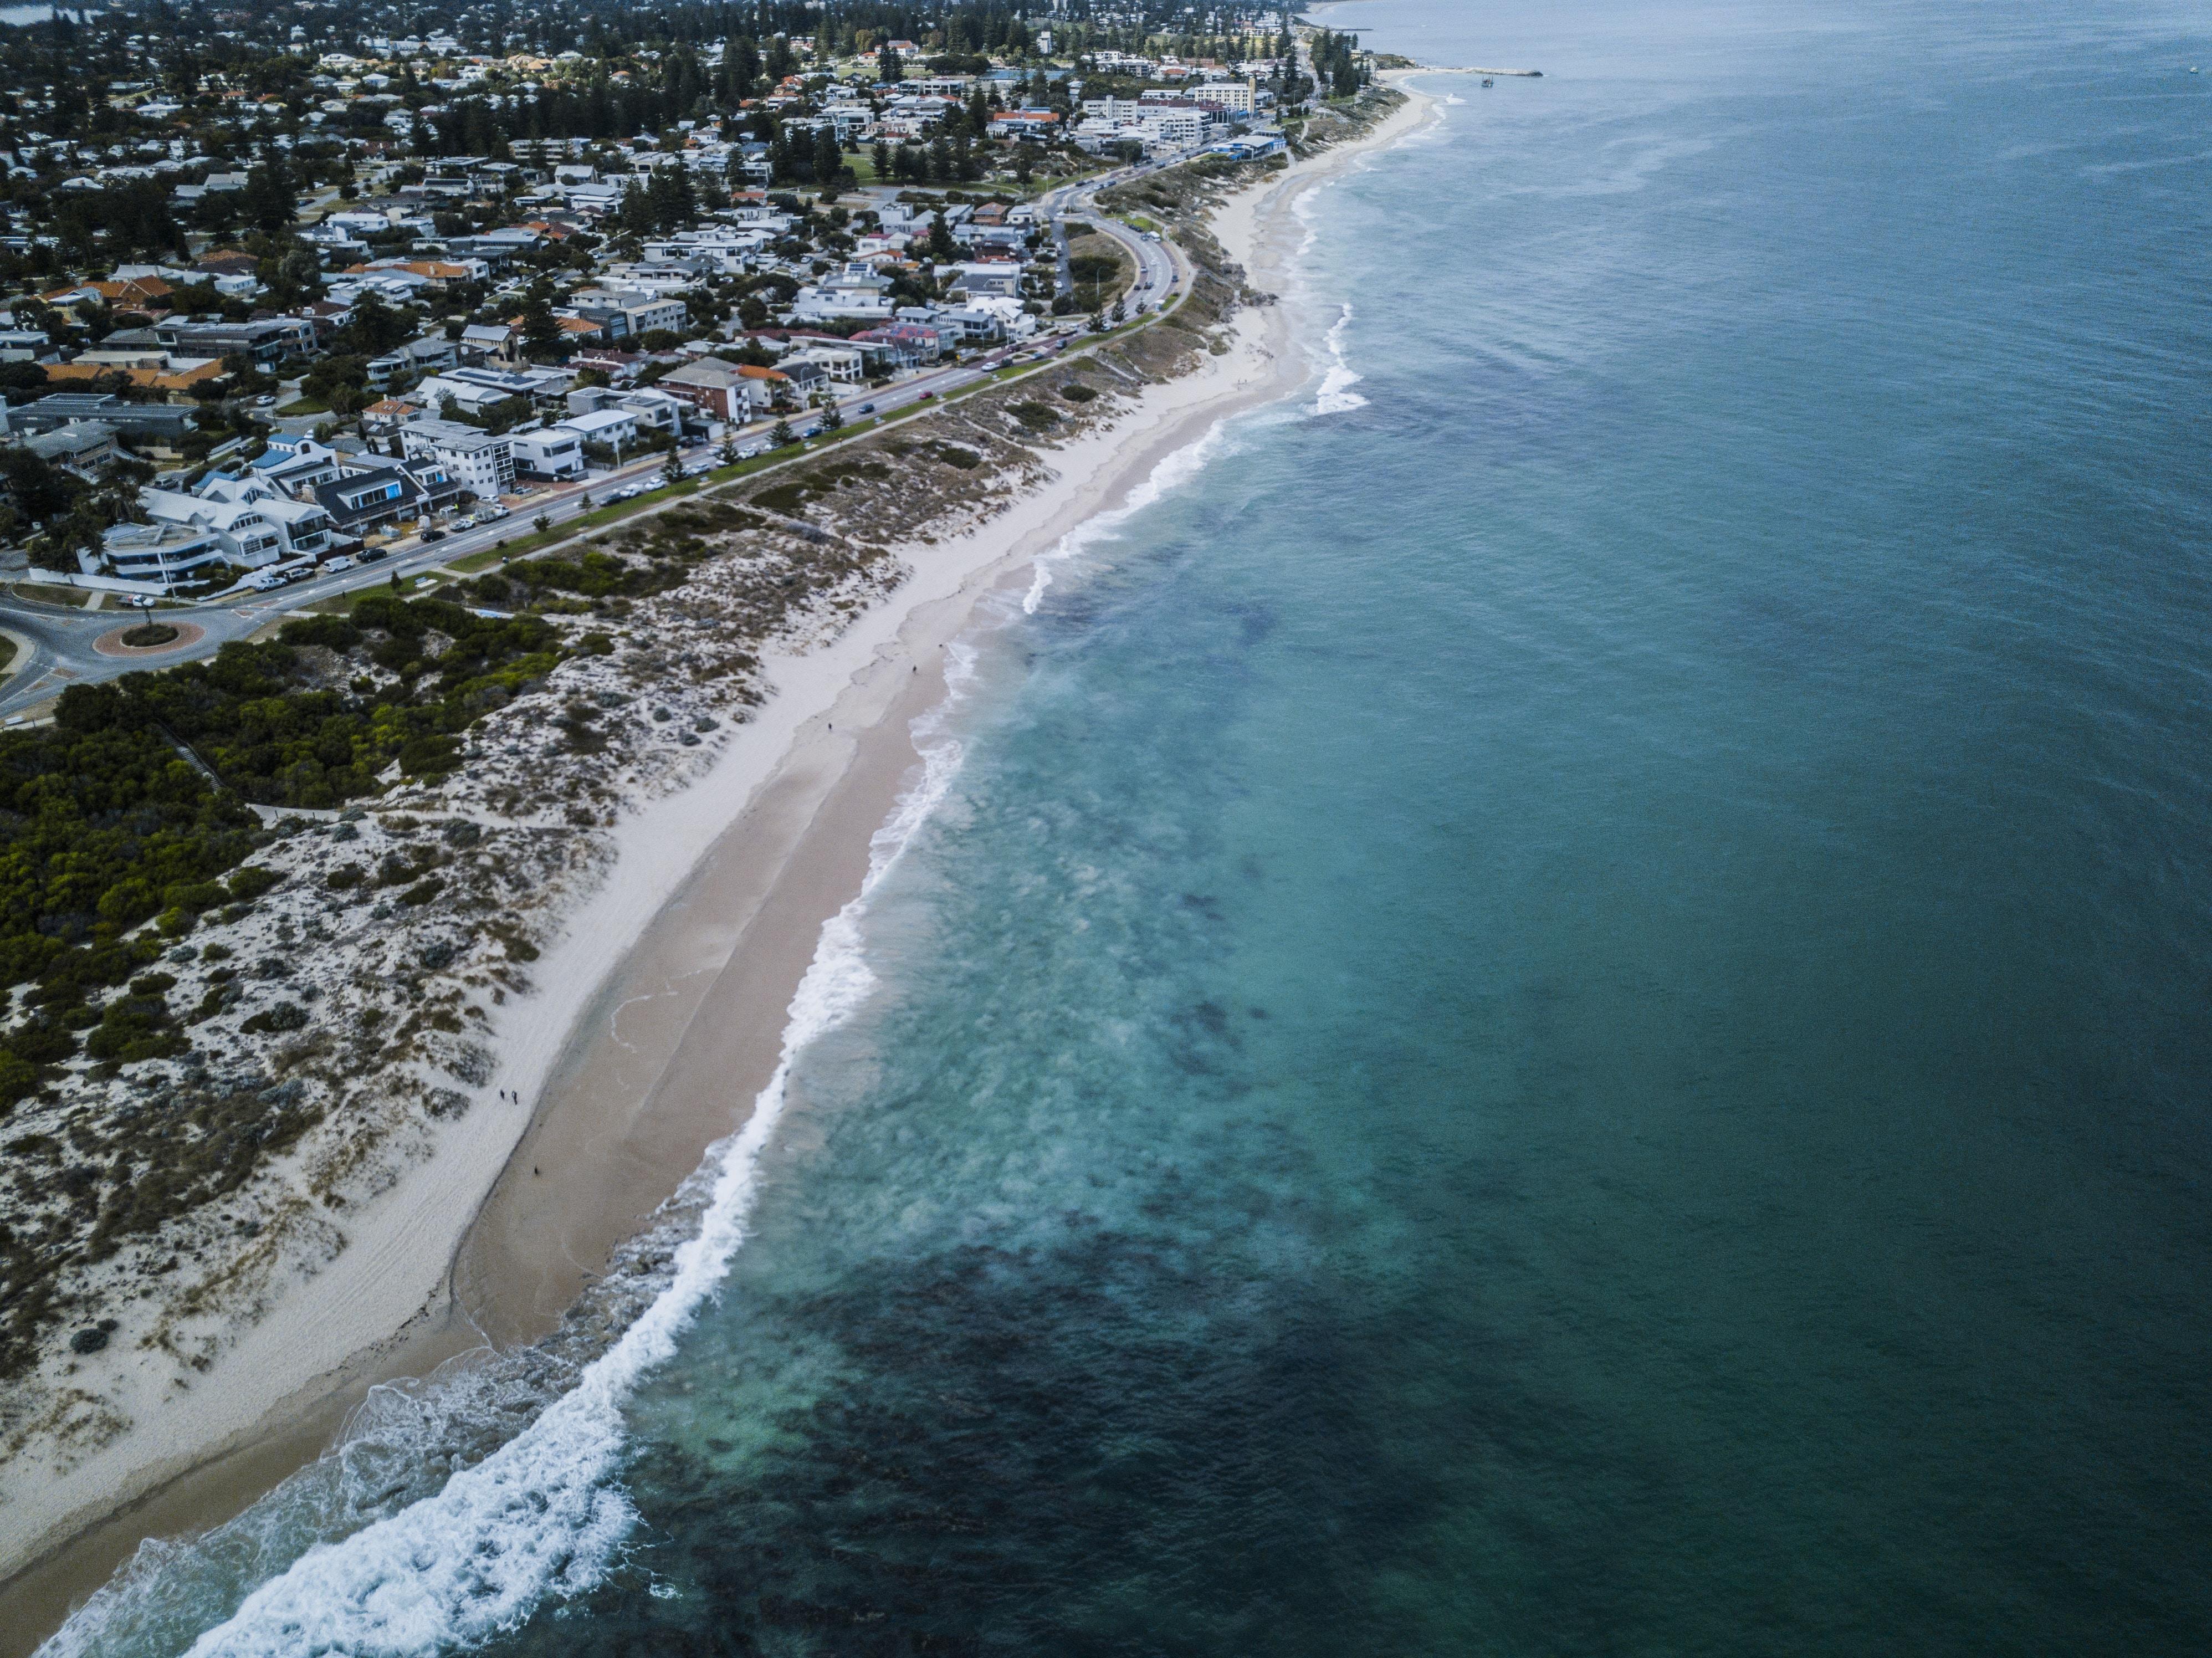 bird's eye view of beach line